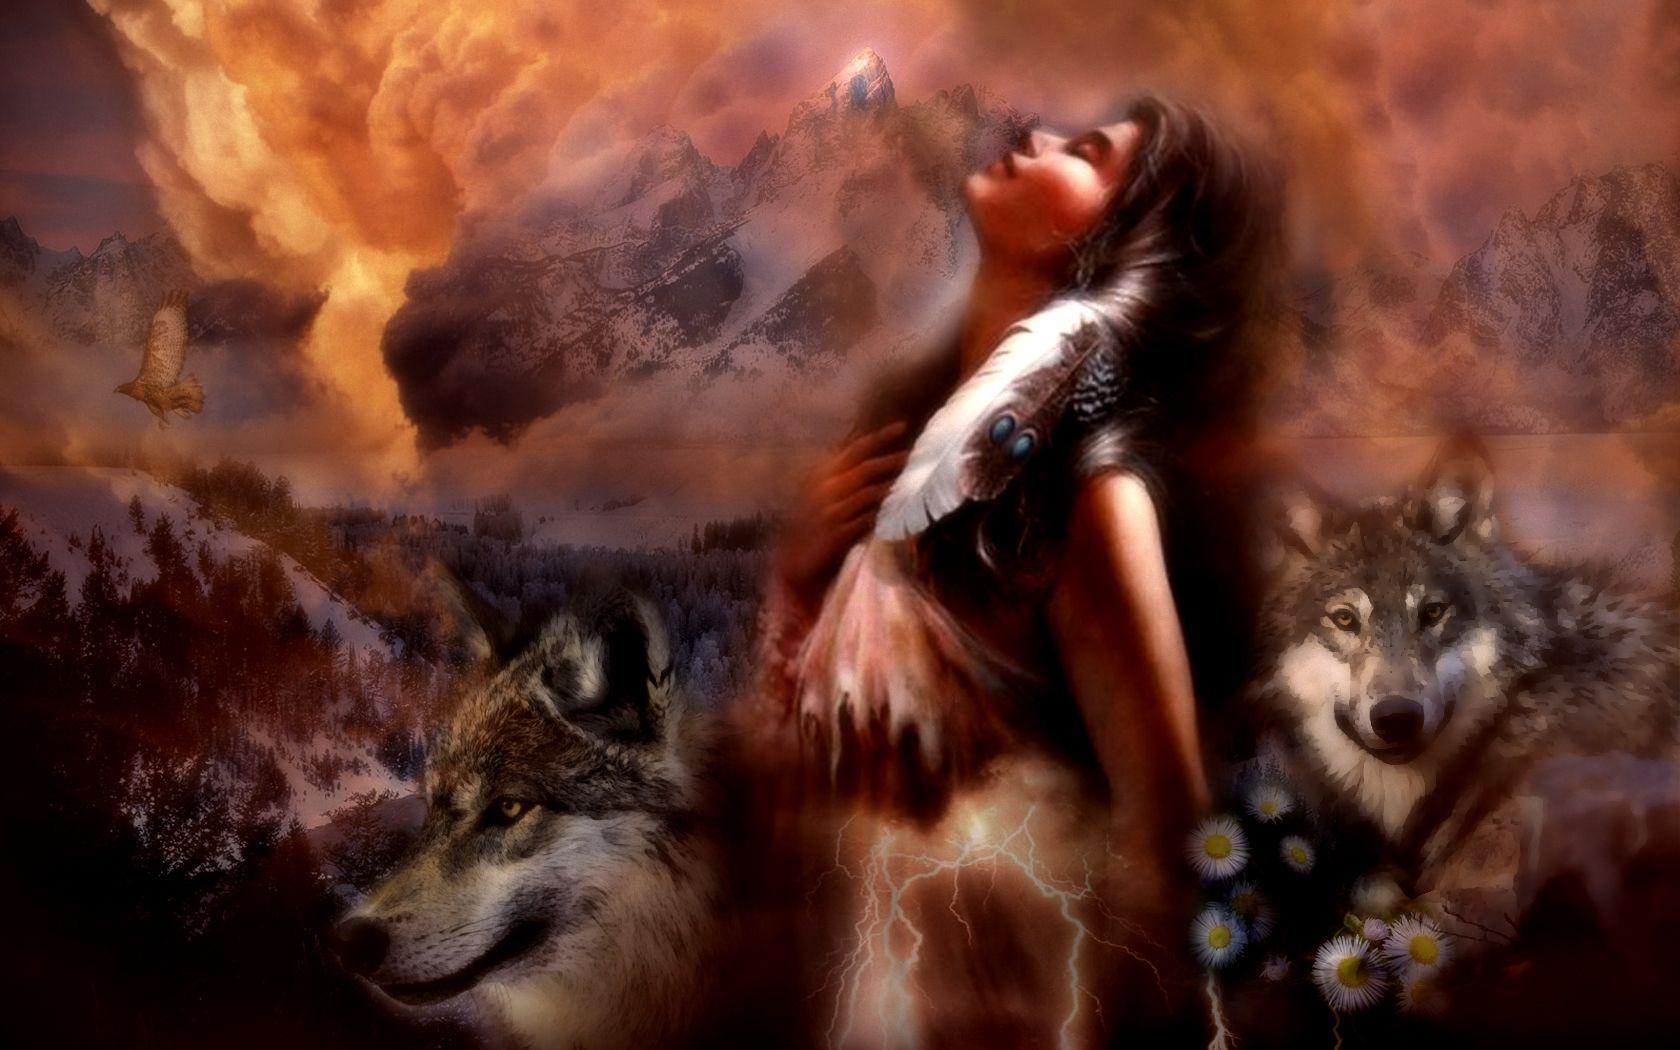 Native American Backgrounds for Facebook wallpaper wallpaper hd 1680x1050